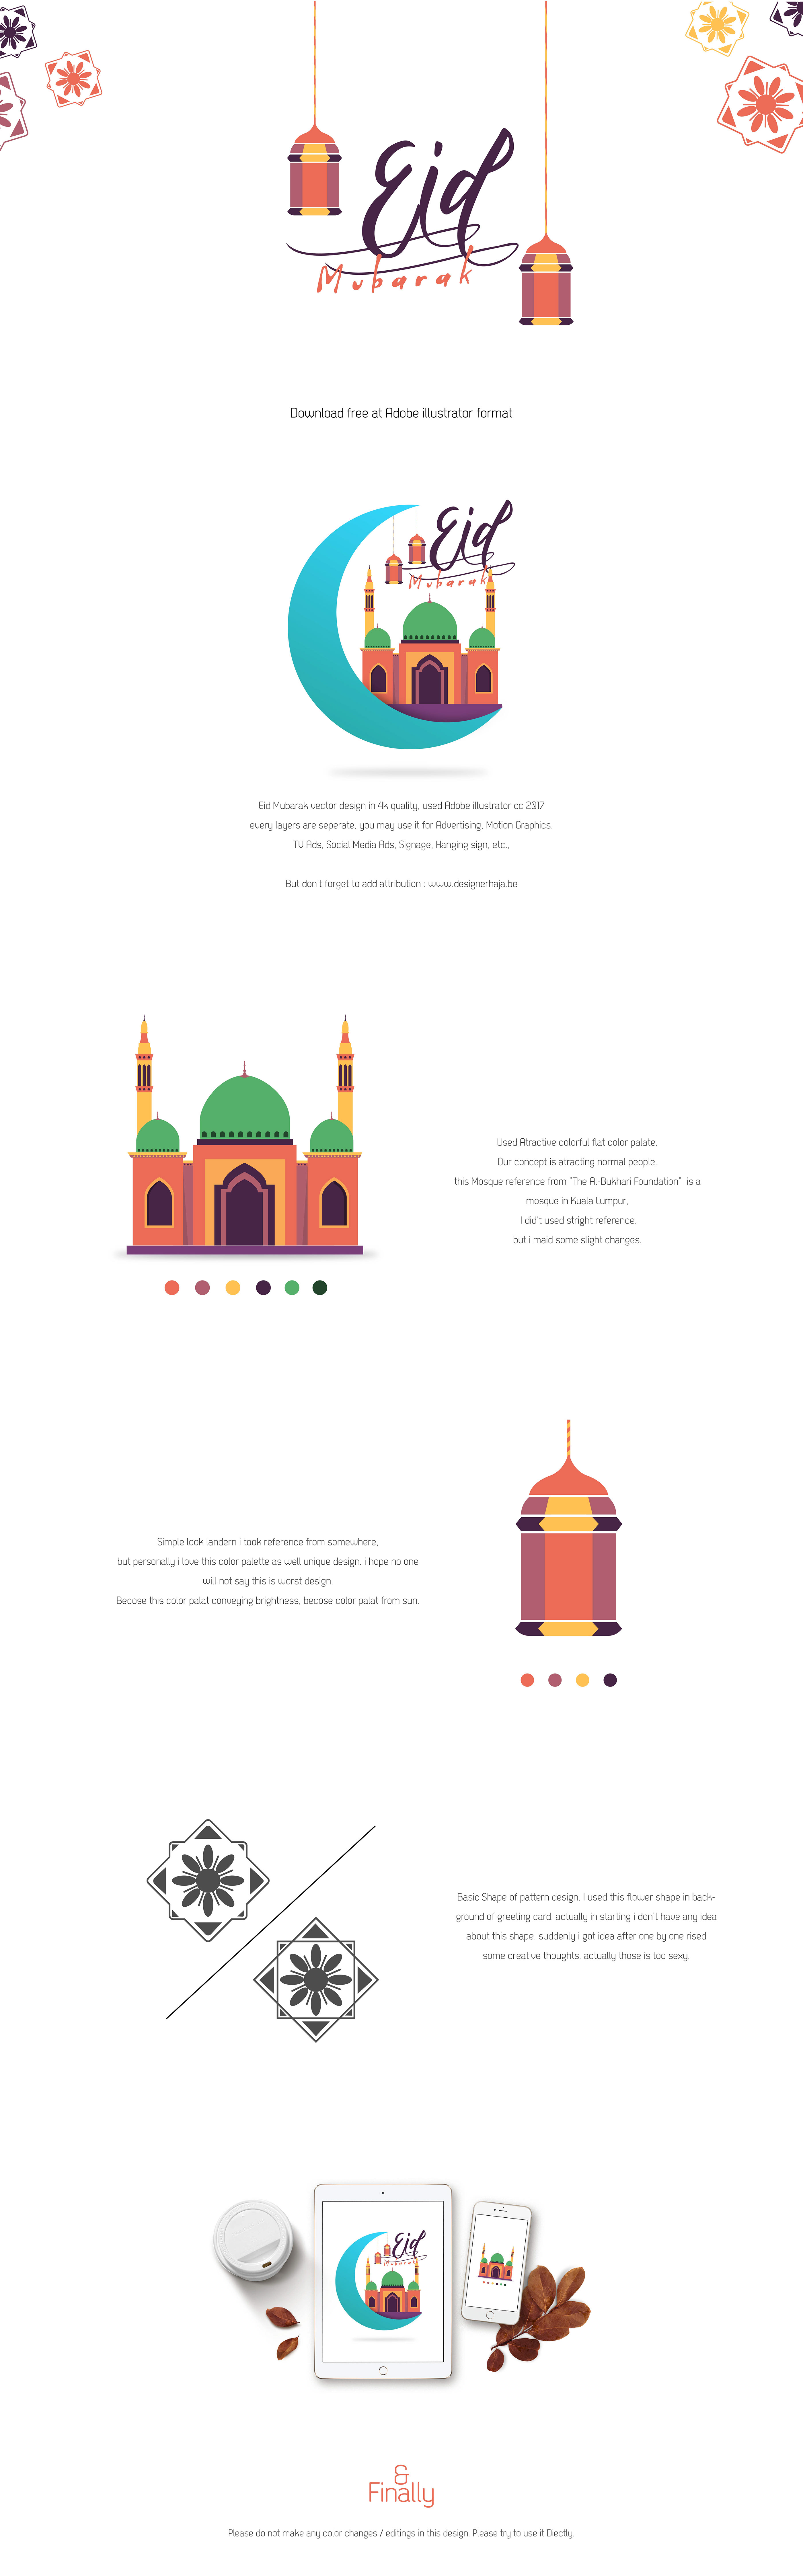 Eid Greeting Free Vector On Behance